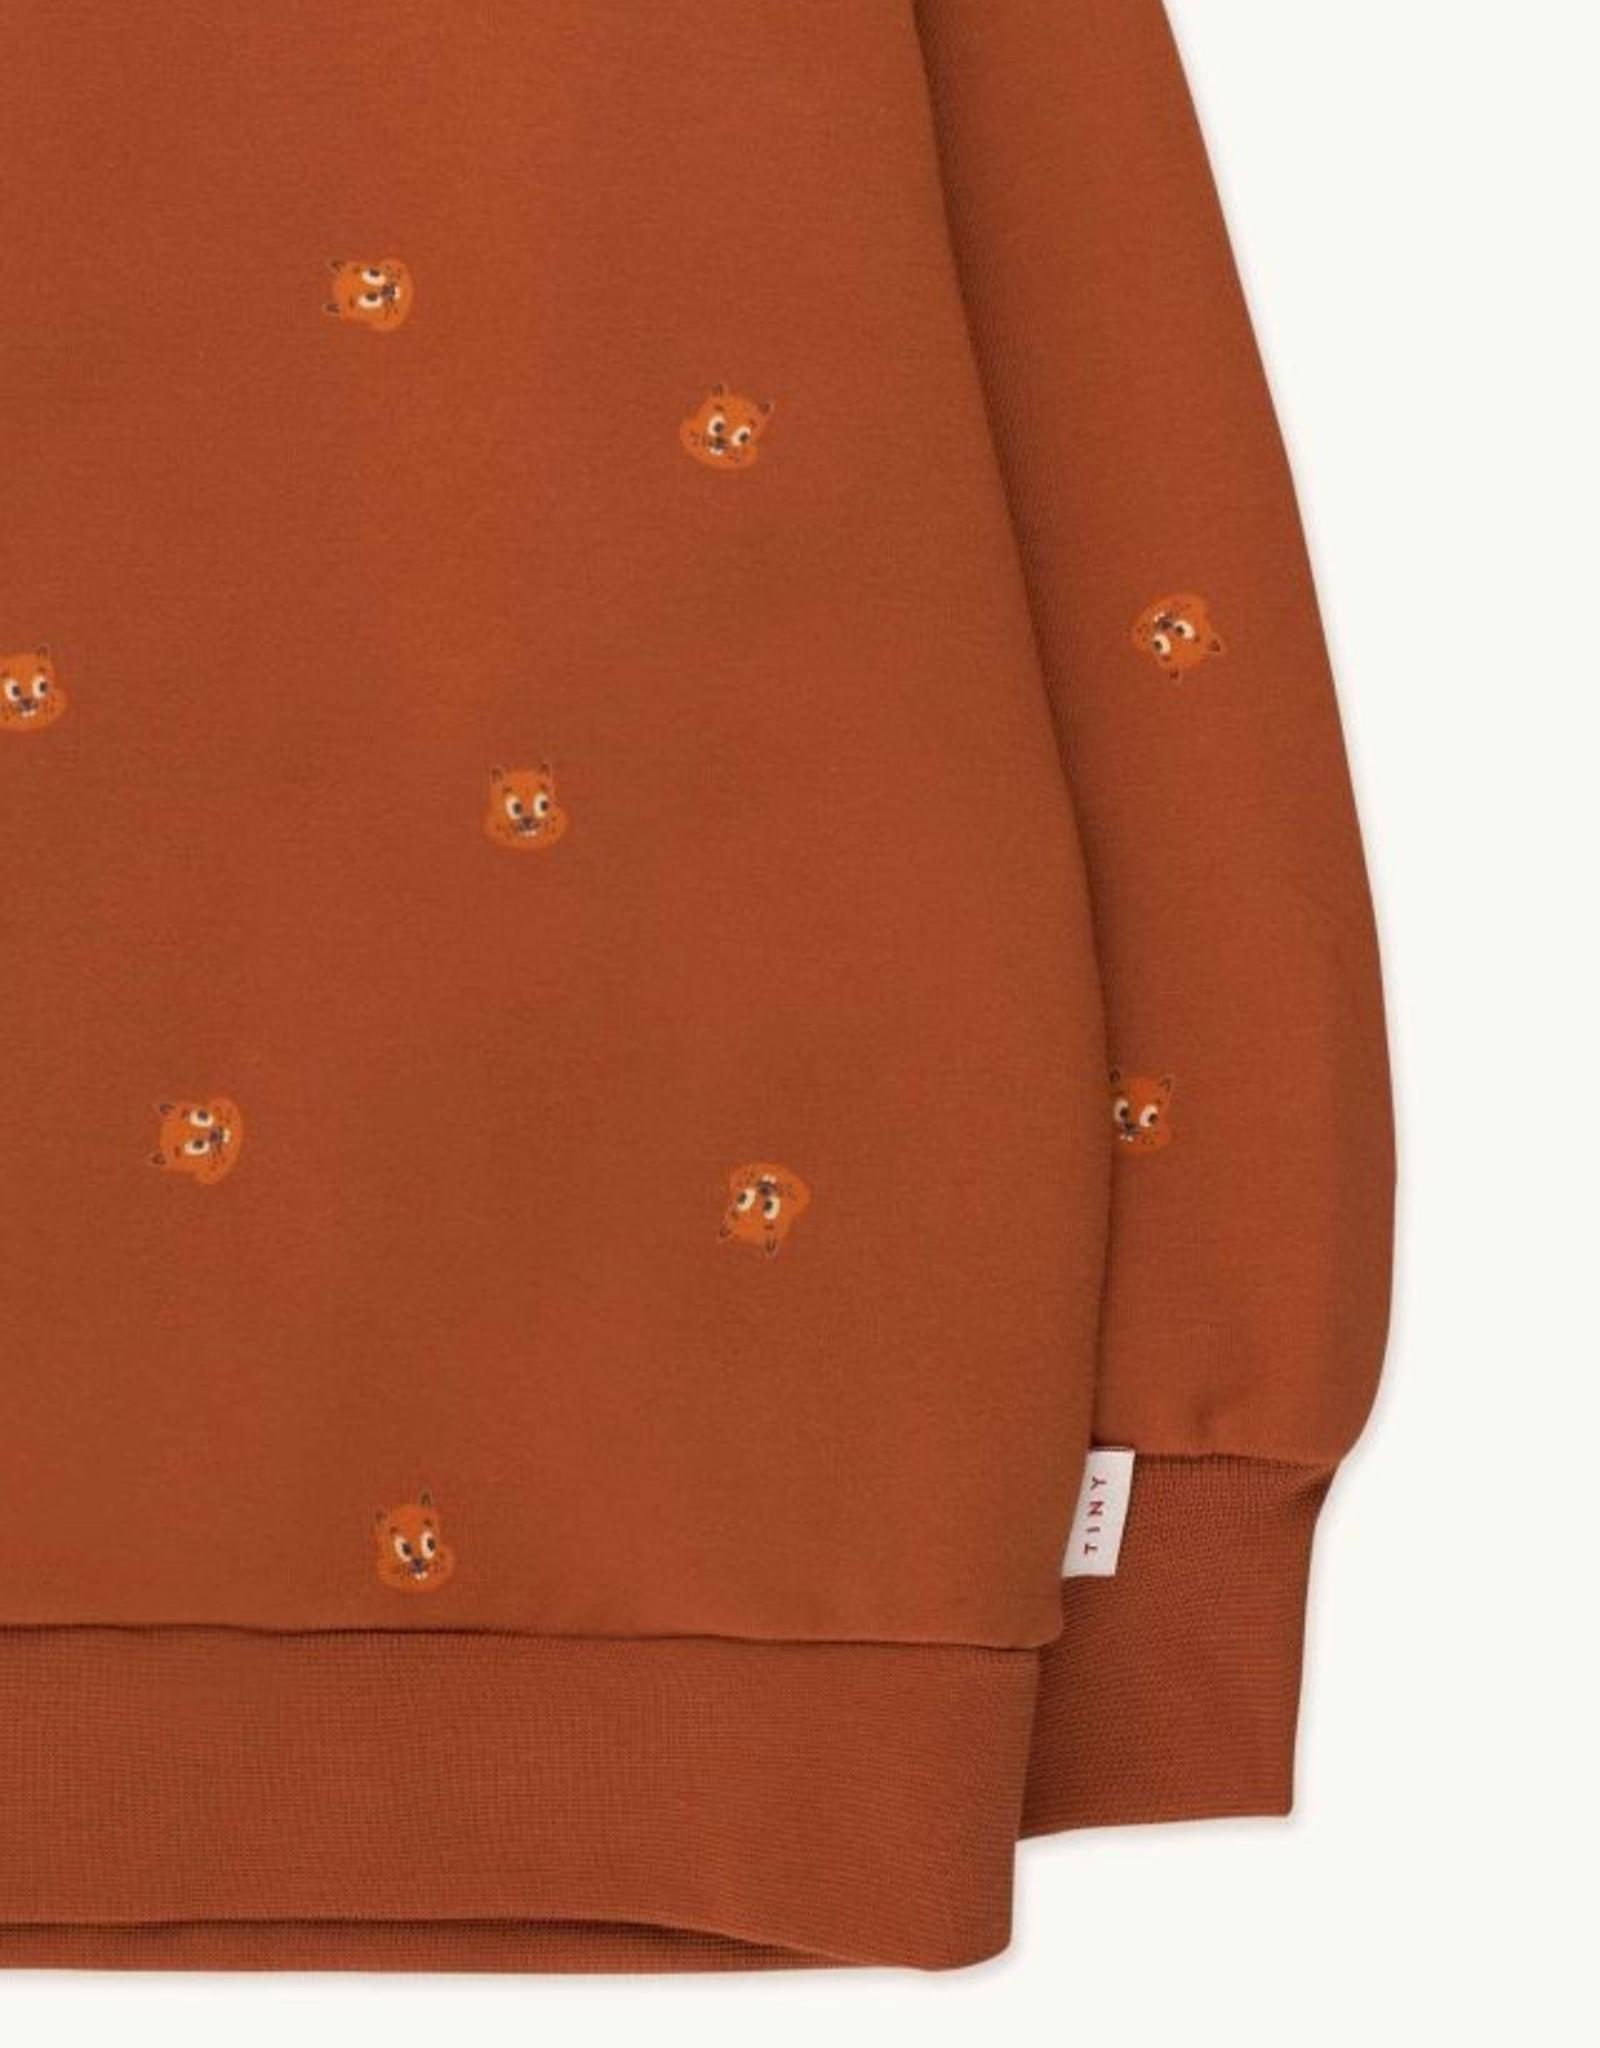 Tinycottons Squirrels Sweatshirt